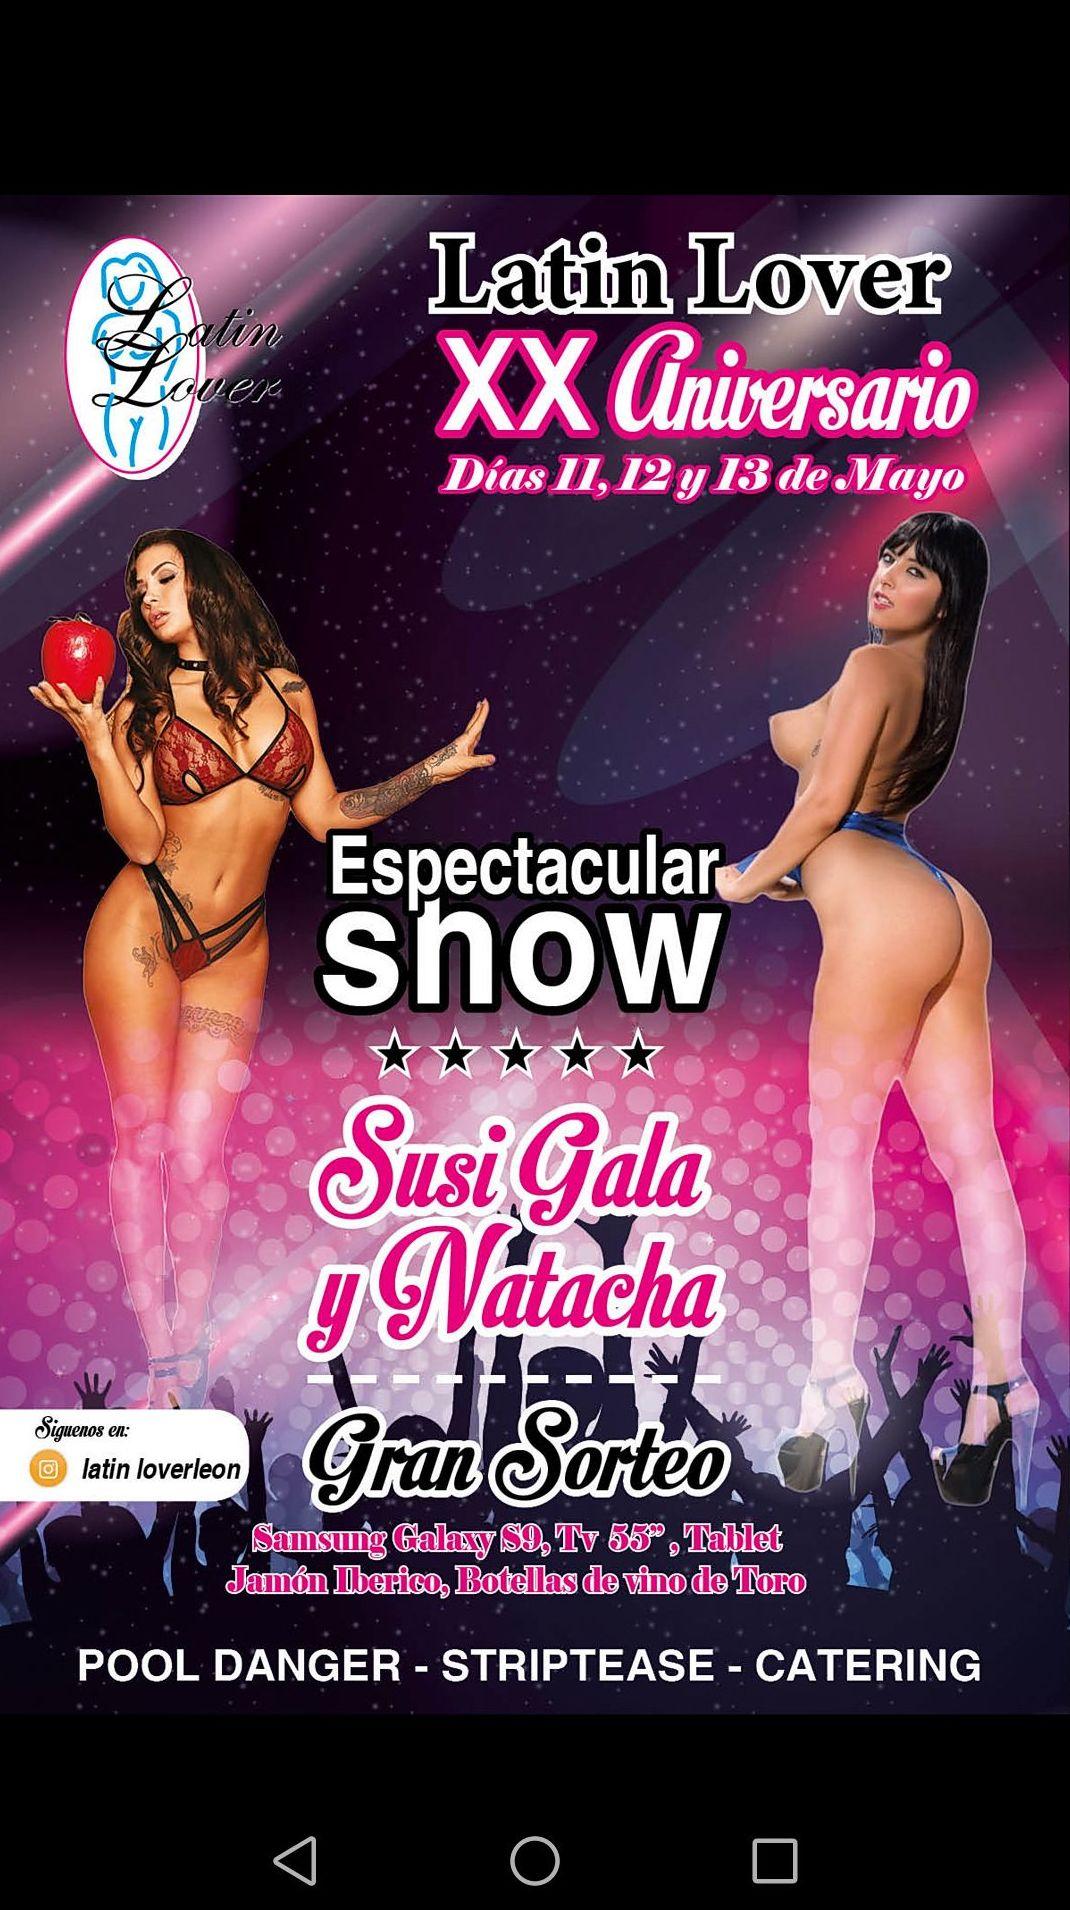 Foto 2 de Clubs nocturnos en  | Latin Lover